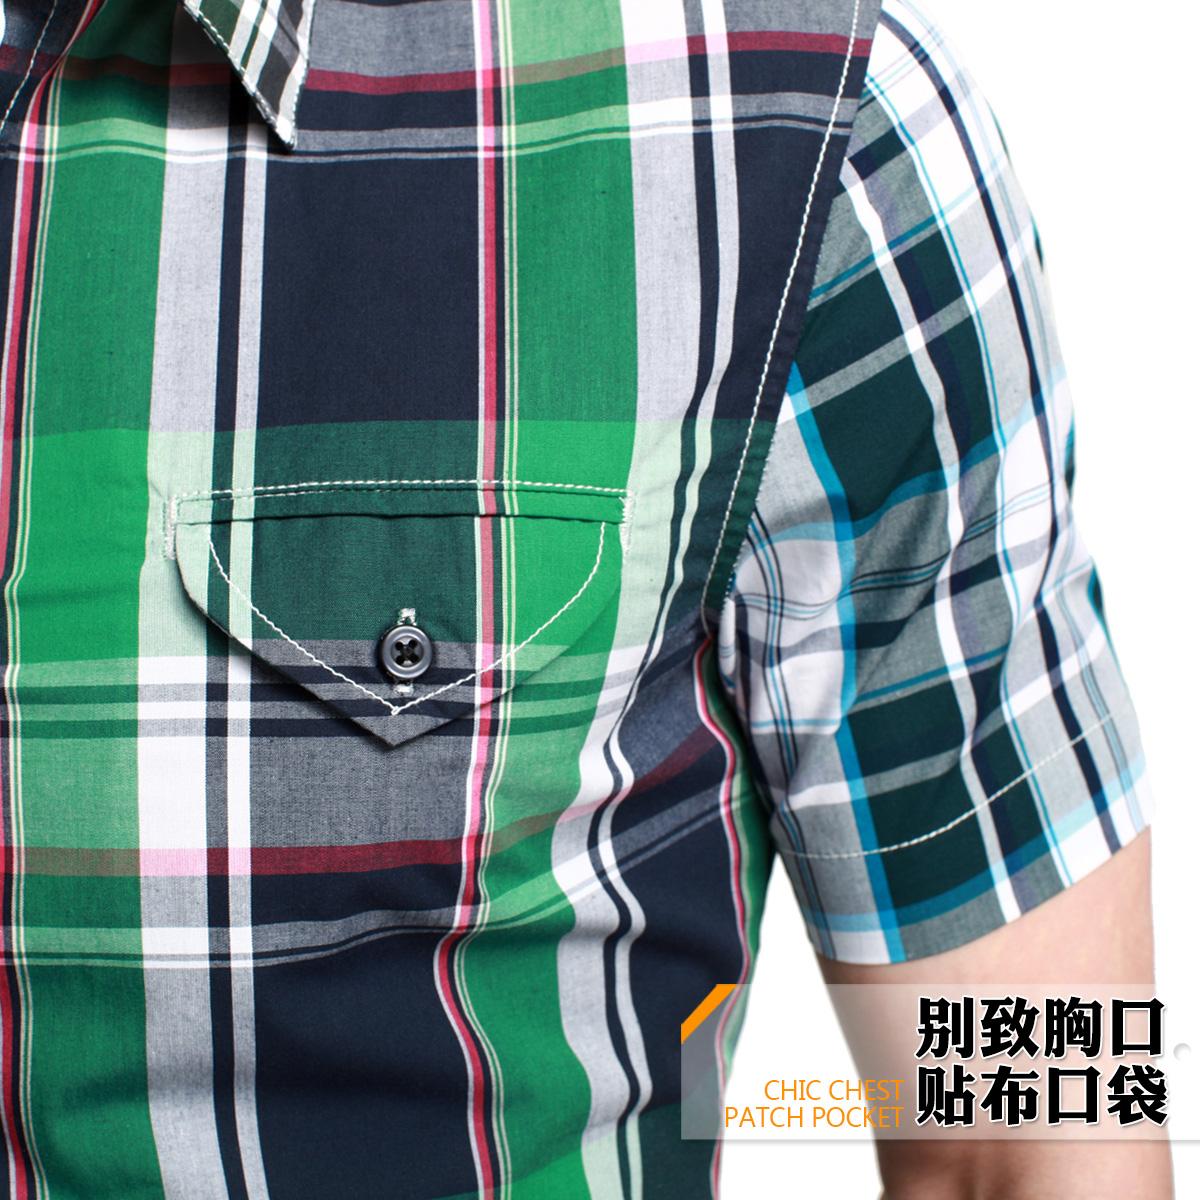 Рубашка мужская KUEGOU FC/12501 FC-12501 Весна 2013 Ткань в клетку С остроконечным лацканом Короткие рукава (длина рукава <35см)